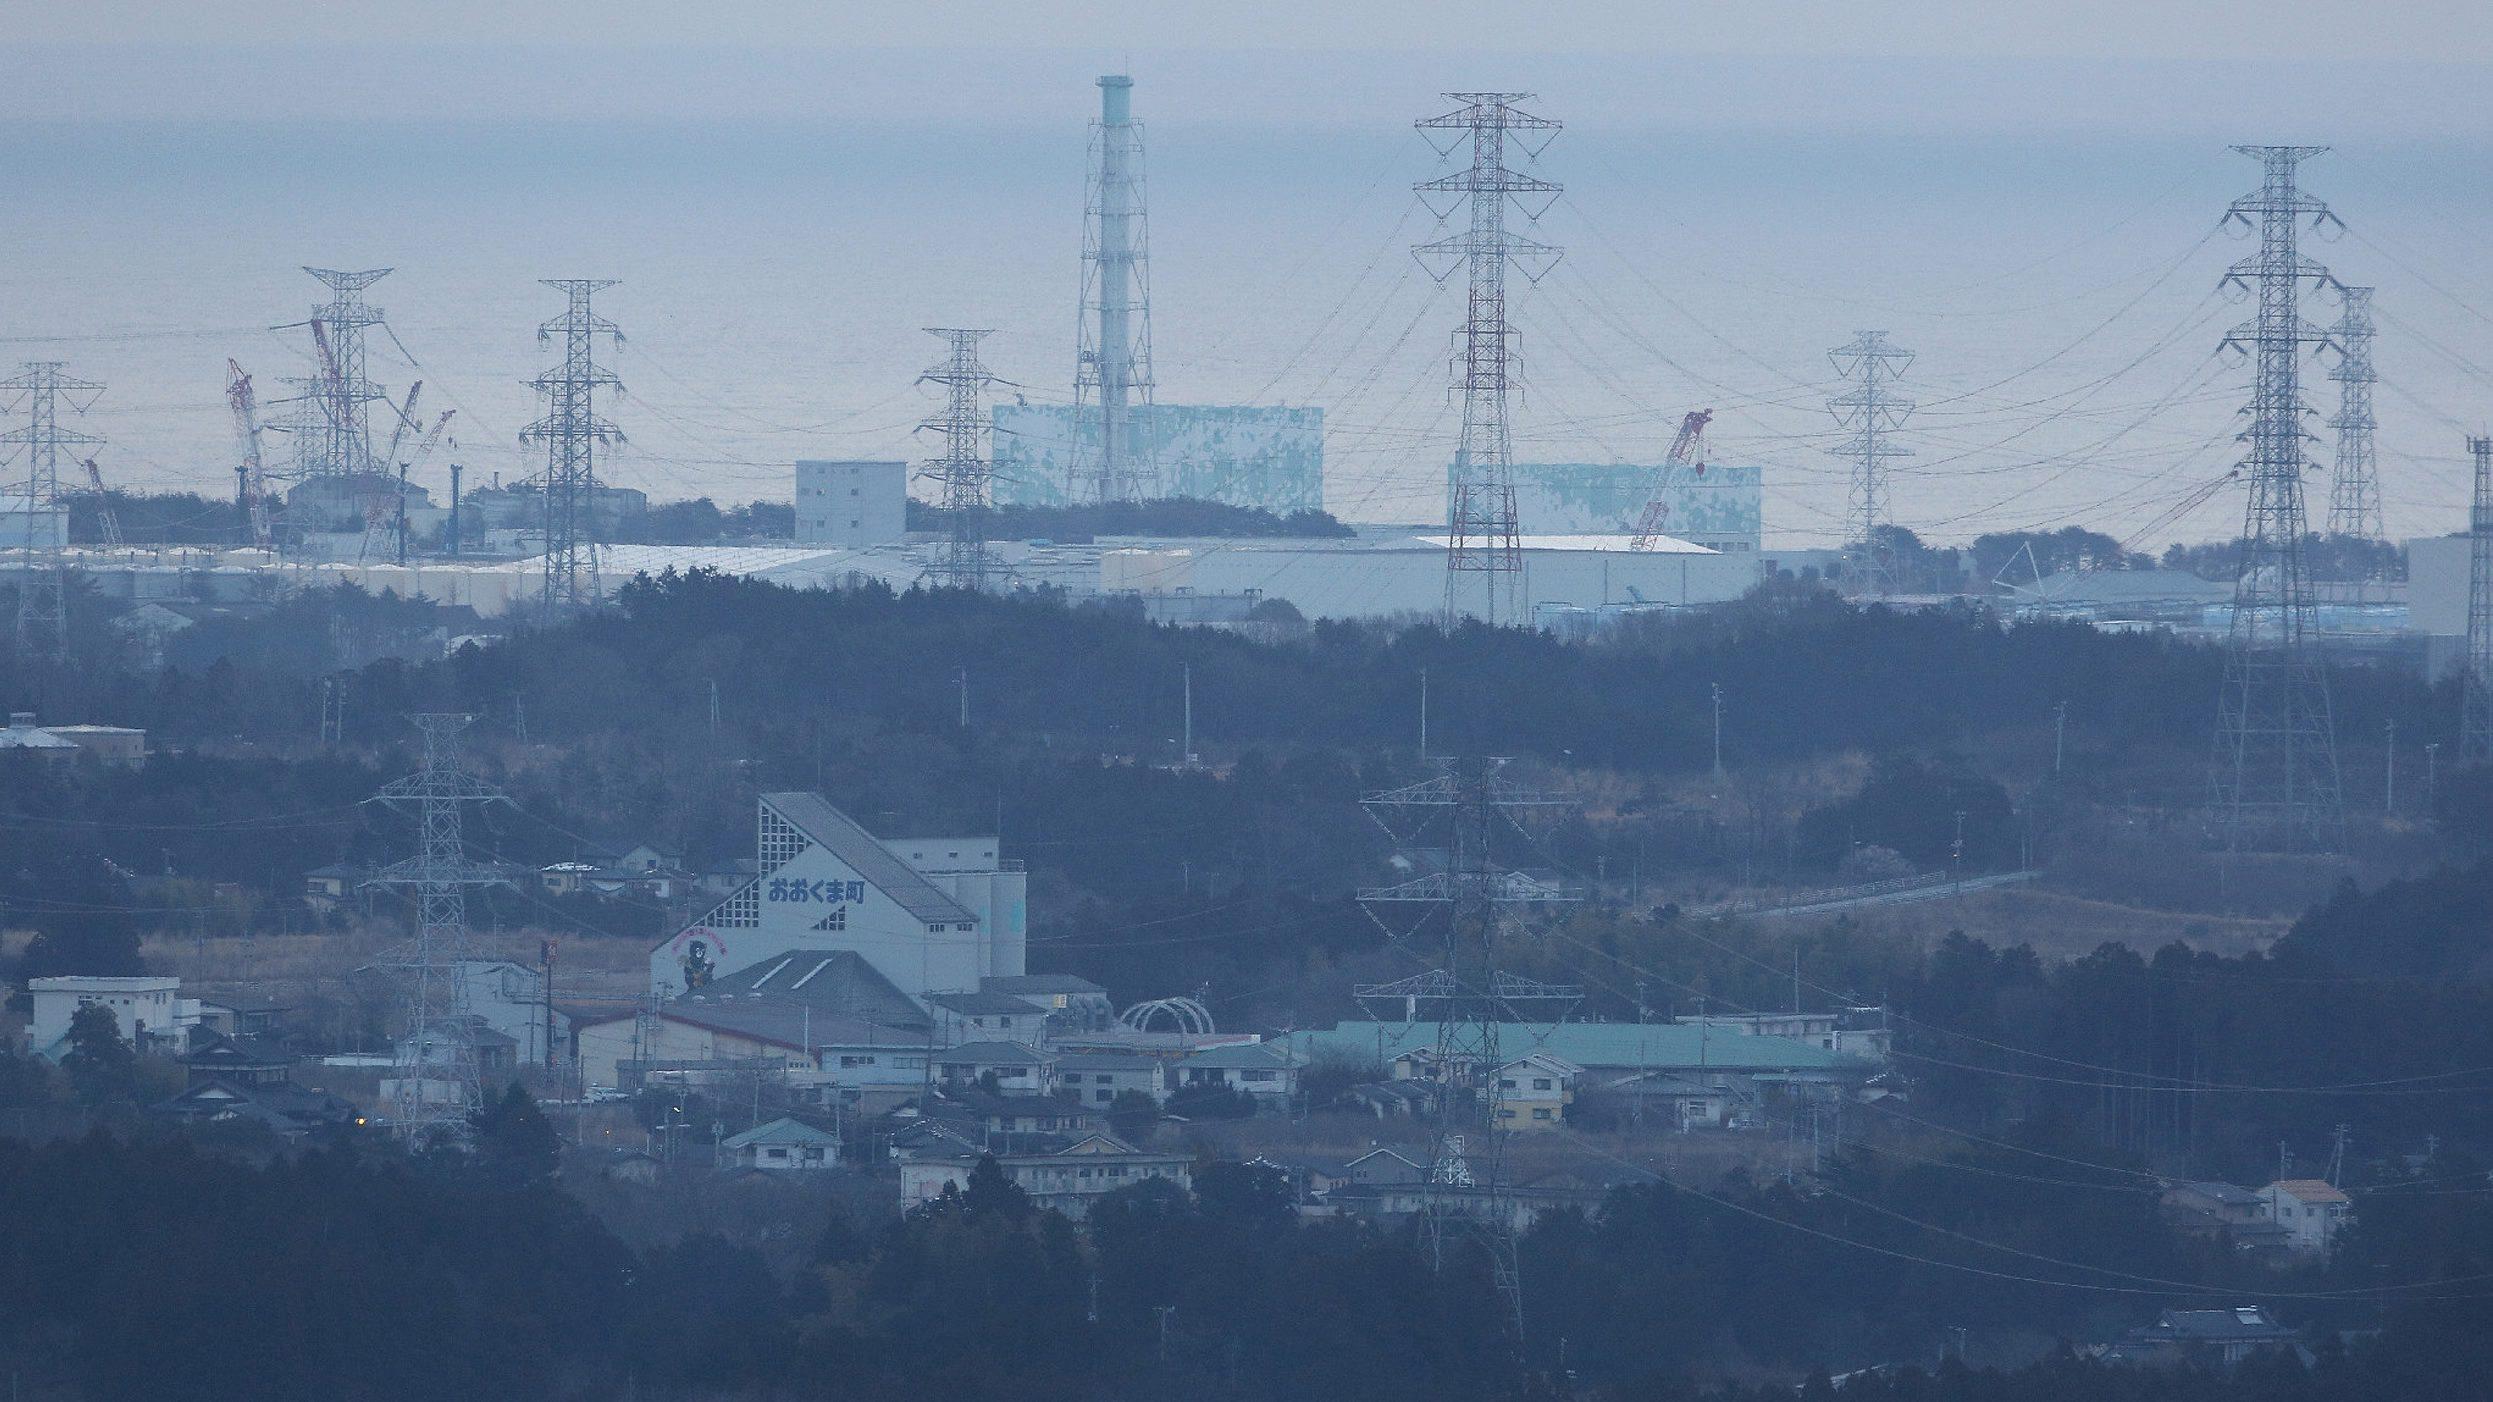 5.4-magnitude quake strikes off Japan's Okinawa Prefecture, no tsunami warning issued